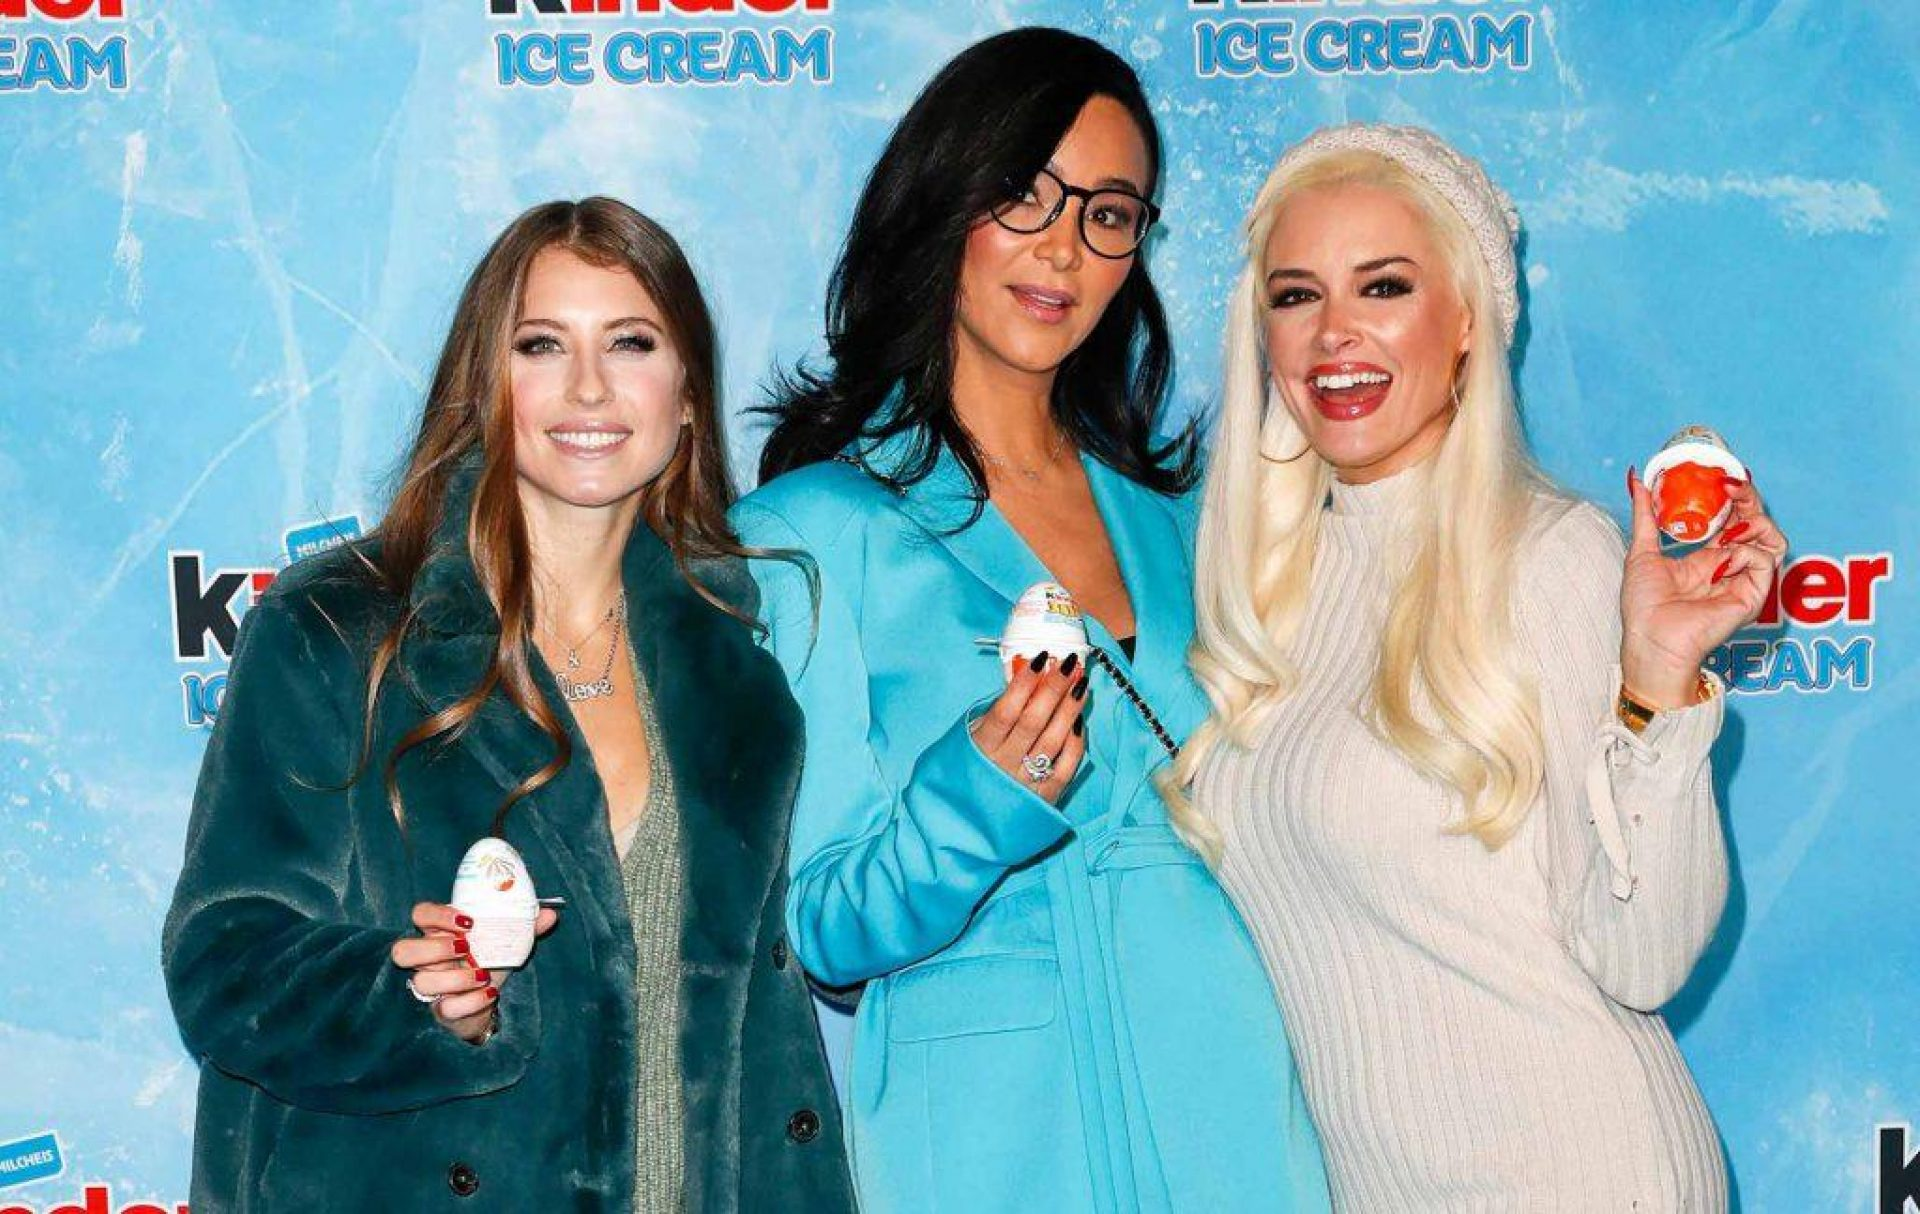 Frozen Store Kinder Eis Eiszeit Cathy Hummels Verona Pooth Daniela Katzenberger